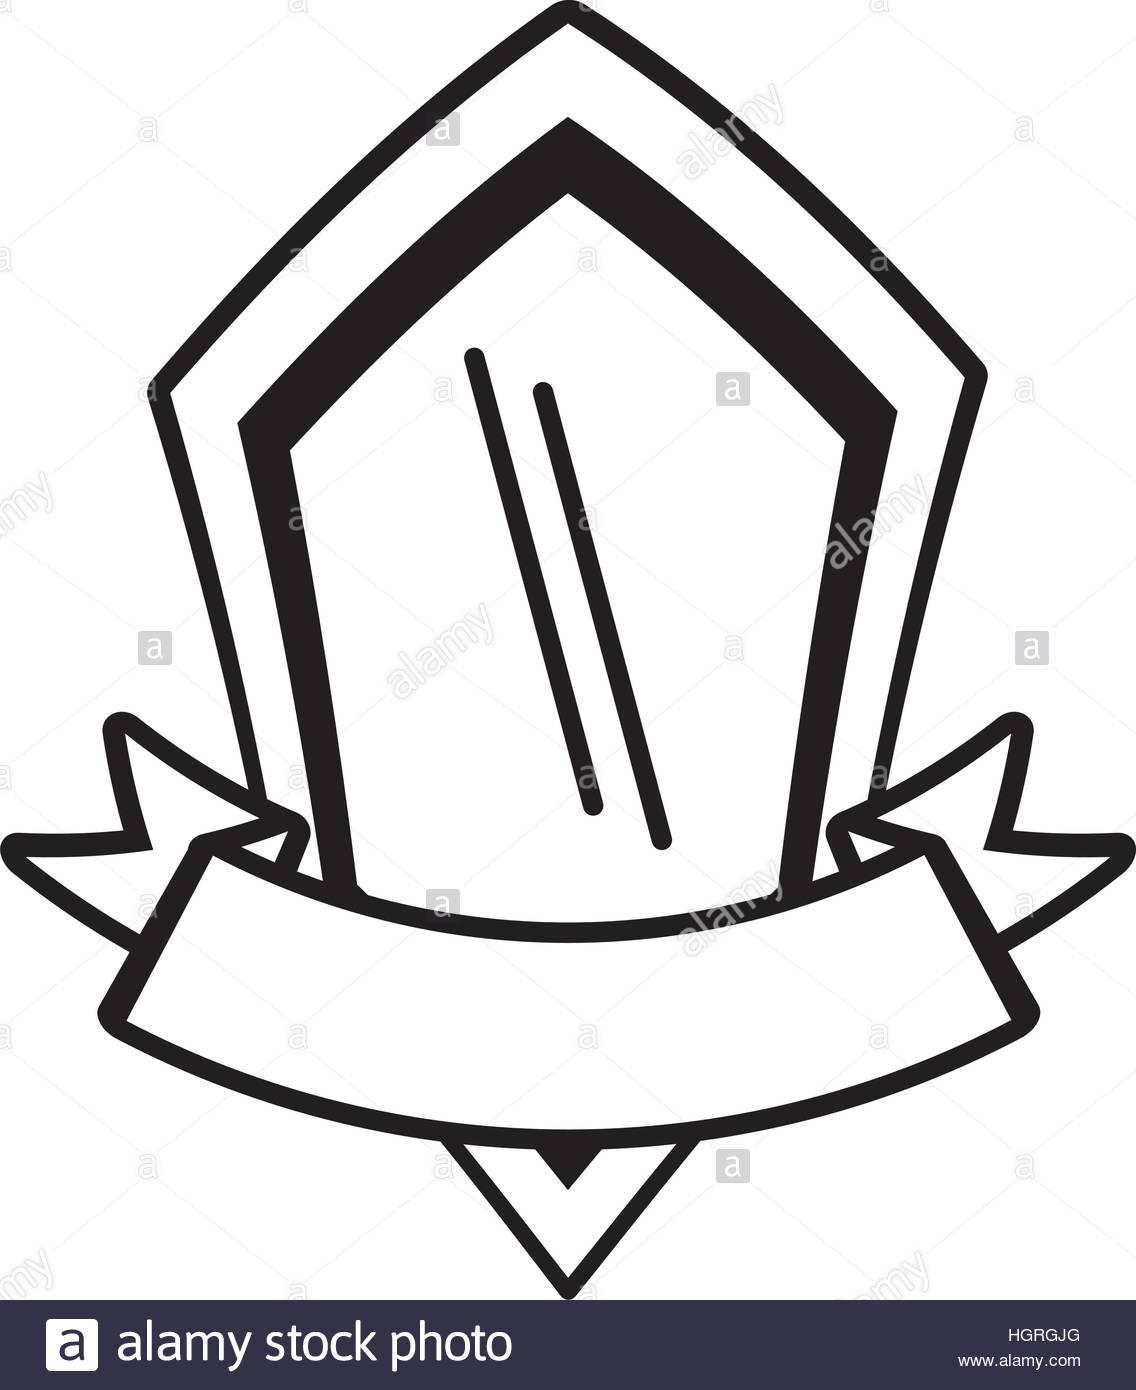 1136x1390 Shield Premium Badge Ribbon Outline Empty Vector Illustration Eps